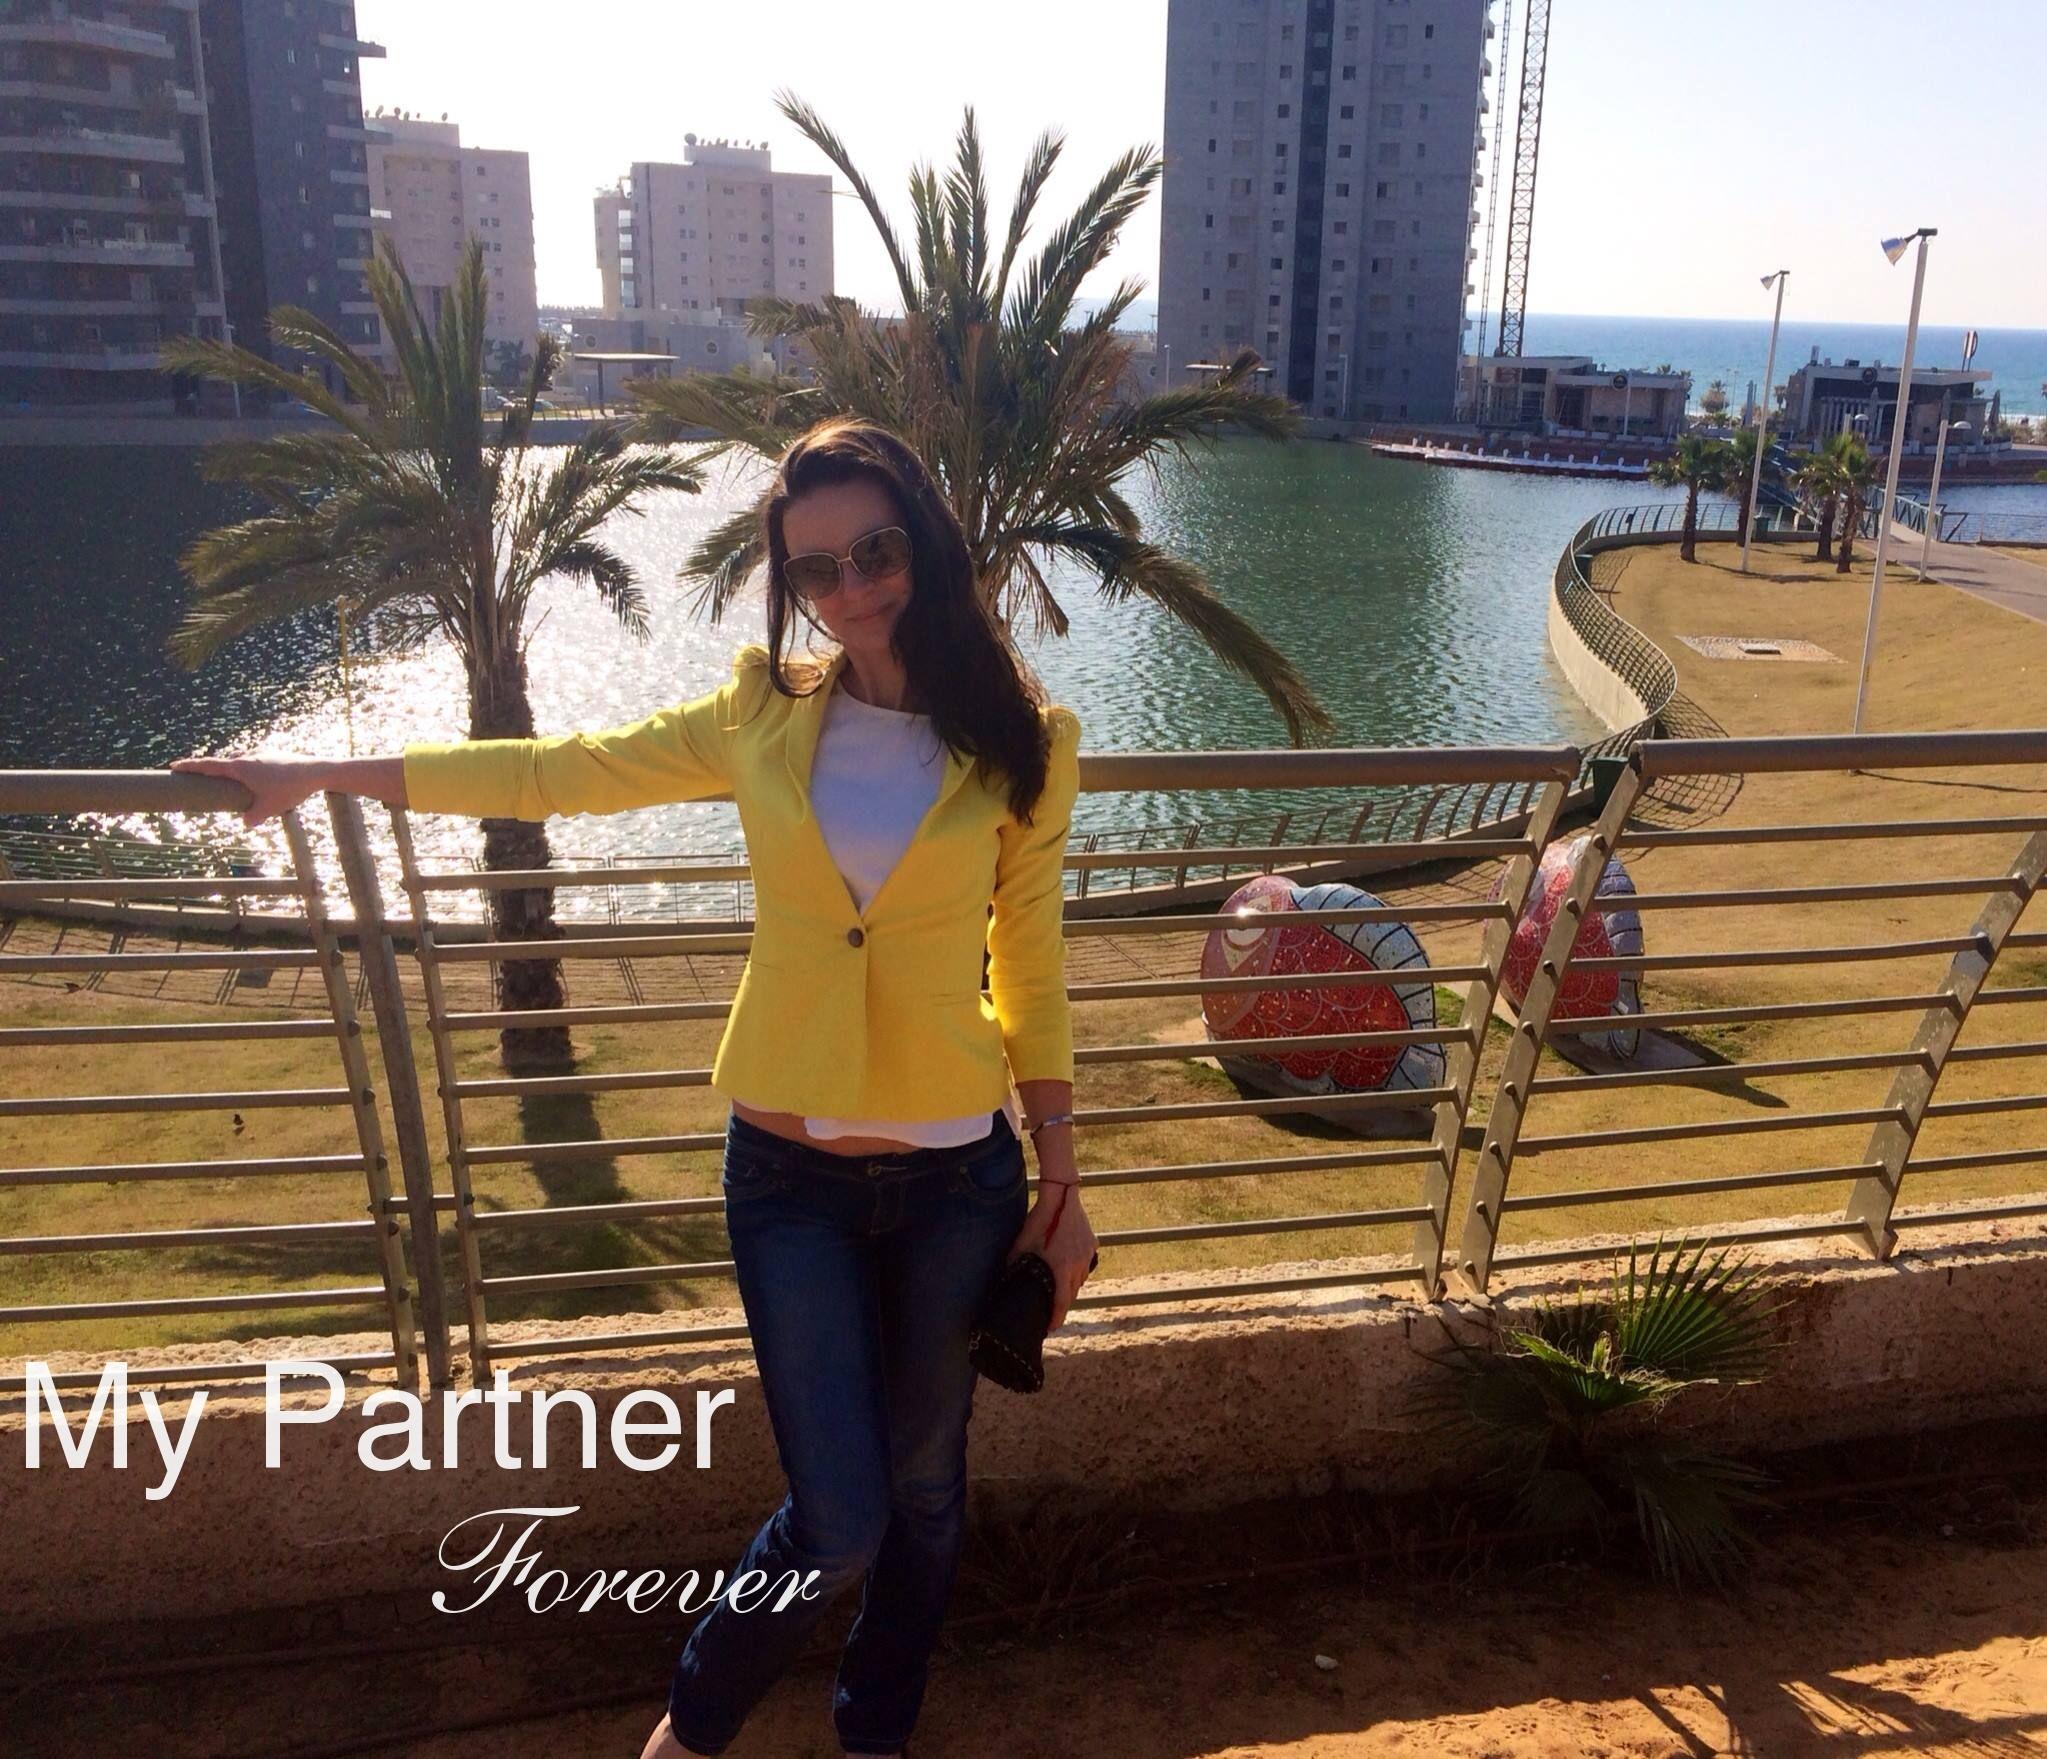 Datingsite to Meet Charming Ukrainian Lady Elena from Kiev, Ukraine